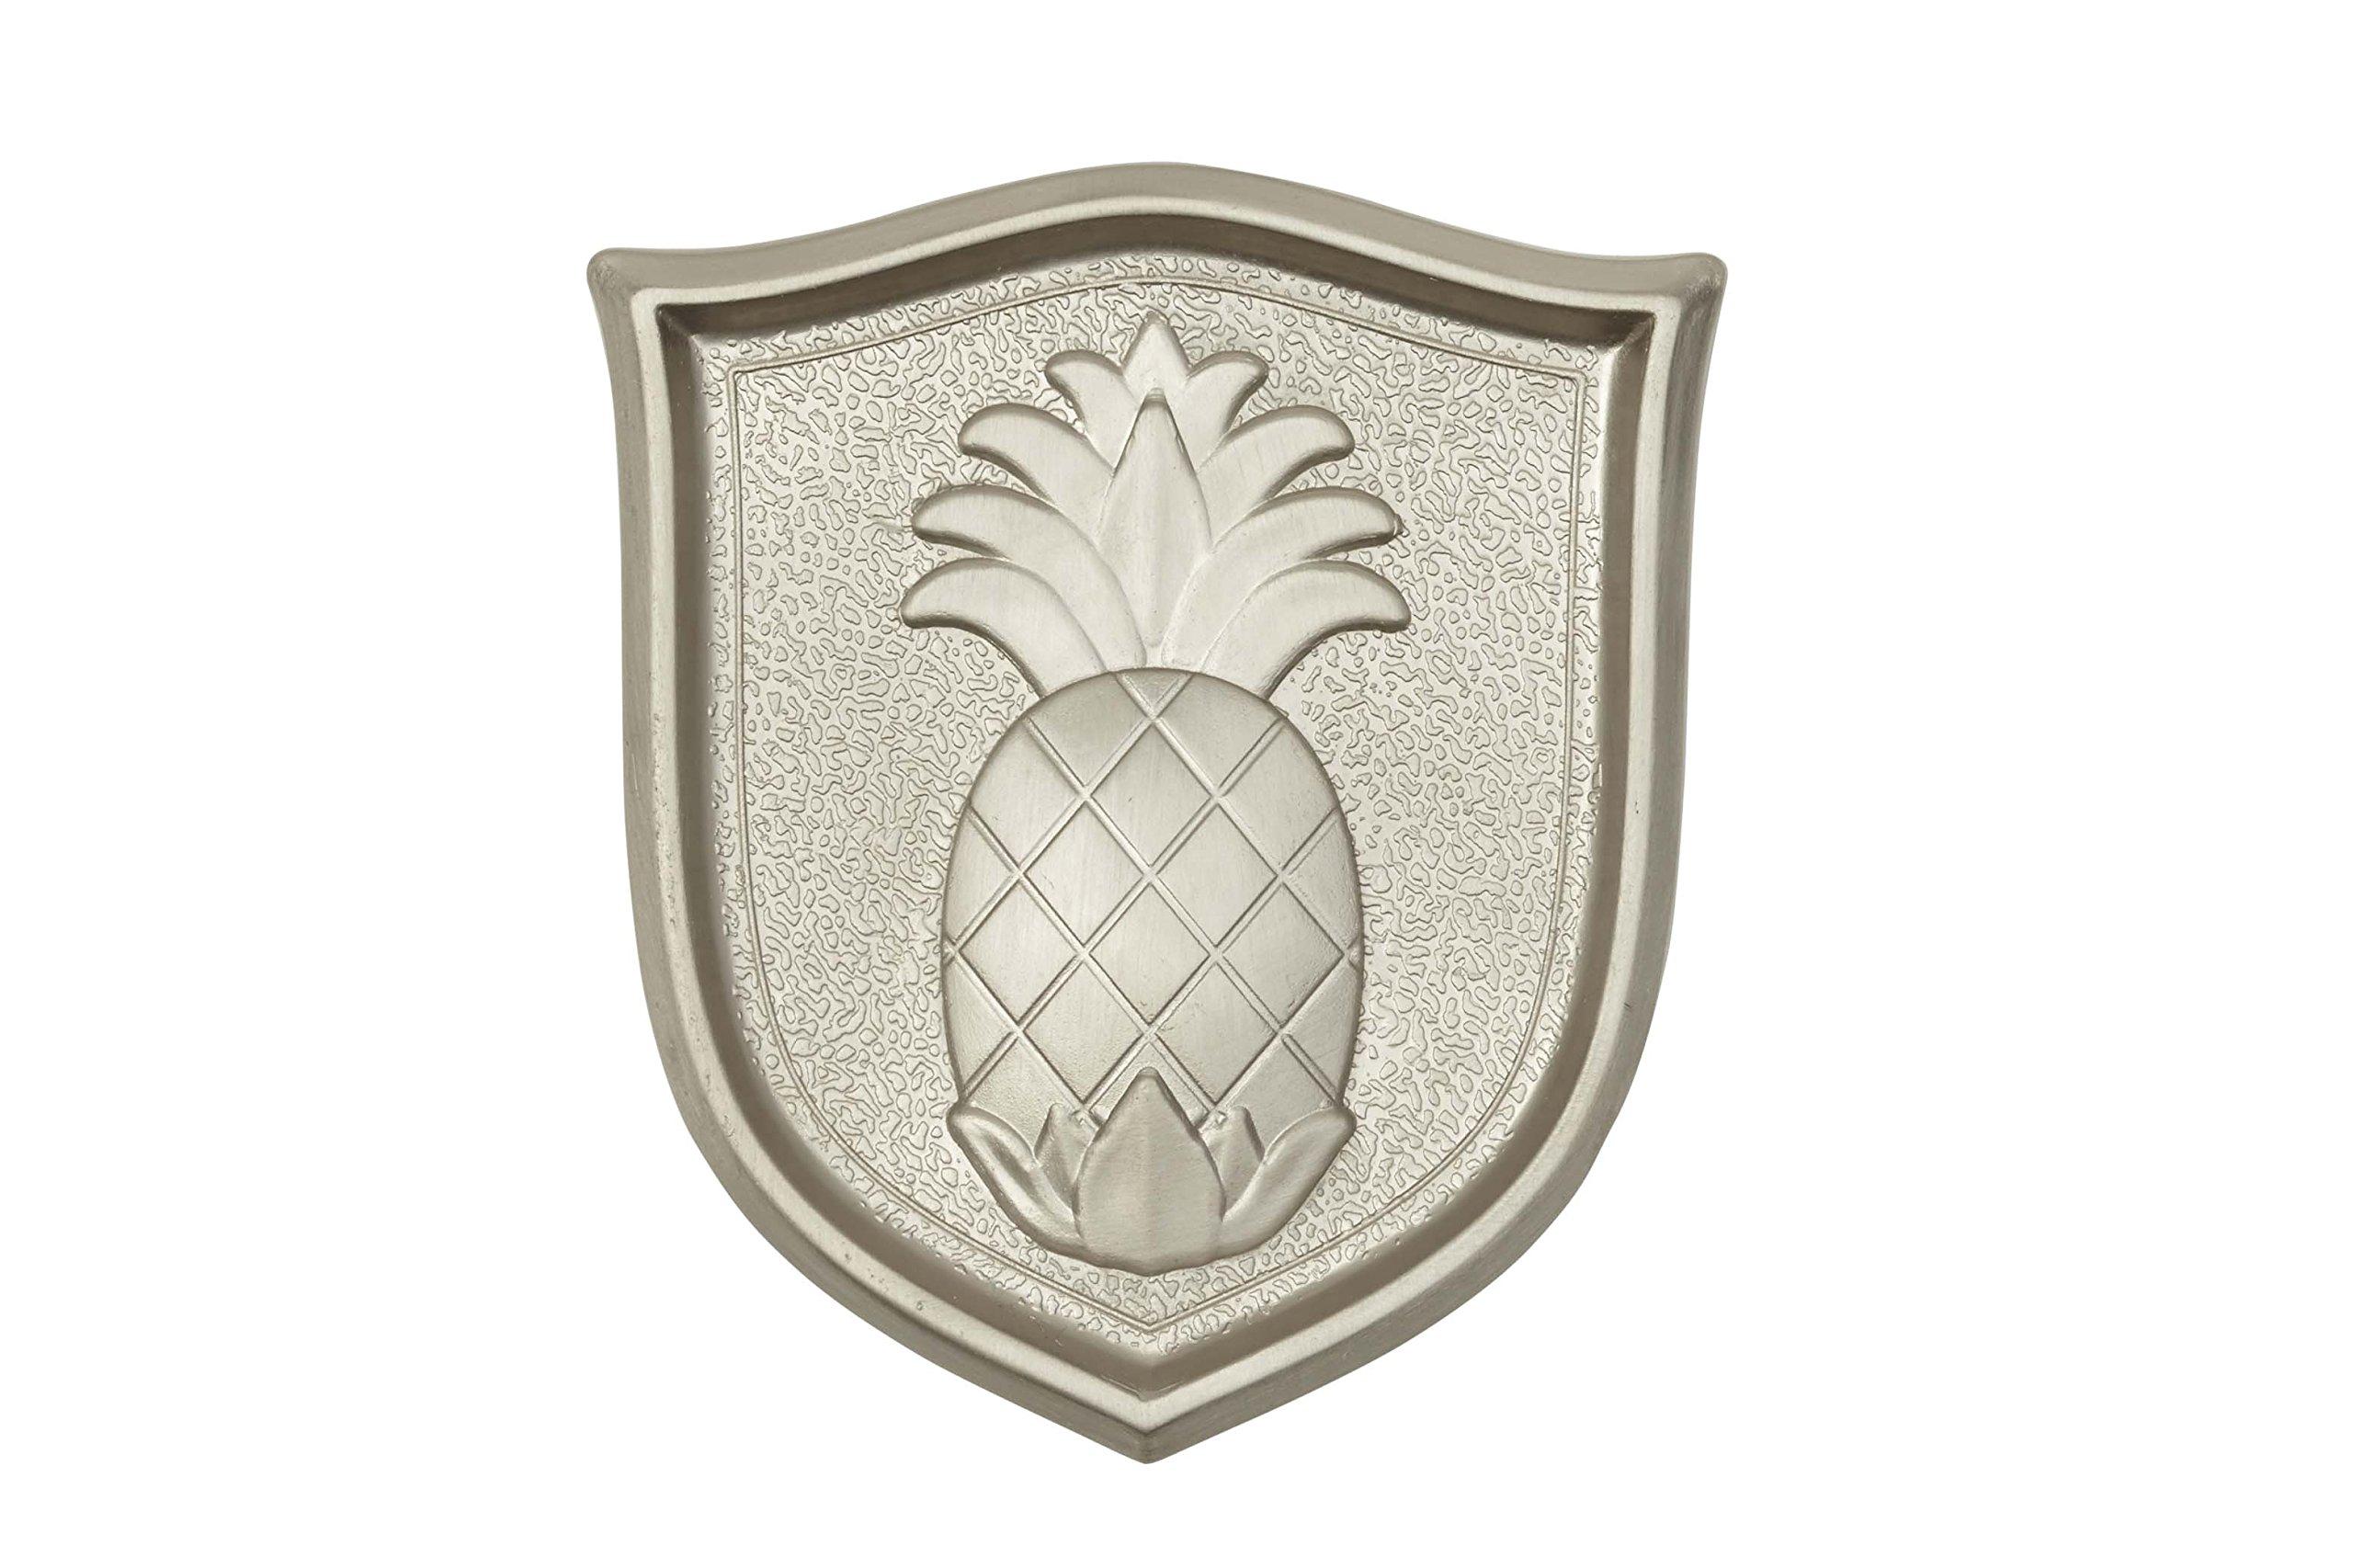 Architectural Mailboxes 3630SN Aluminum Satin Nickel Pineapple Emblem by ARCHITECTURAL MAILBOXES